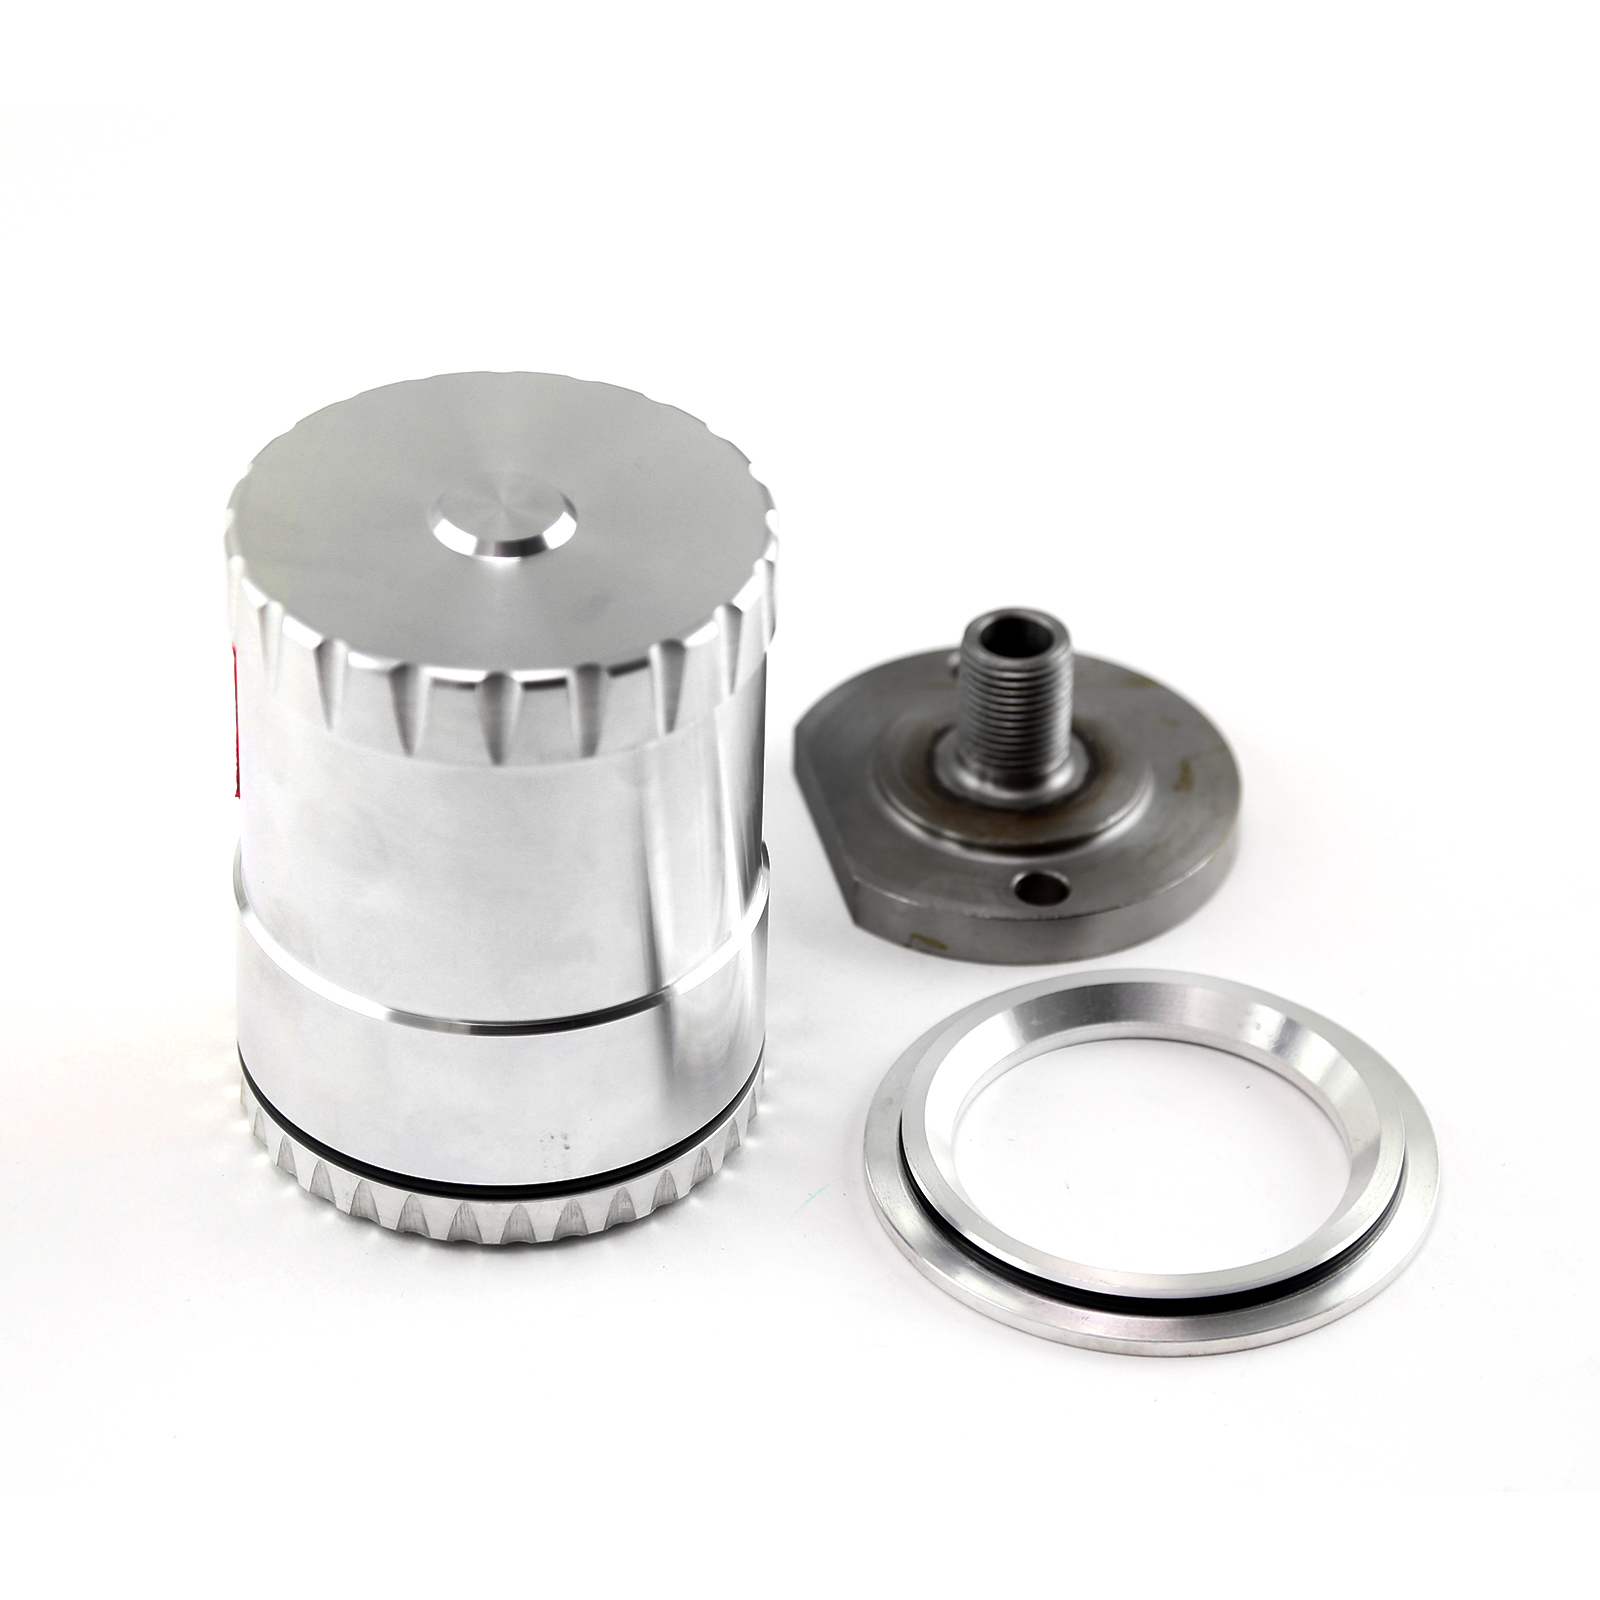 GM Chevy Billet Aluminum Reusable Oil Filter w/Stainless Steel Element & Magnet